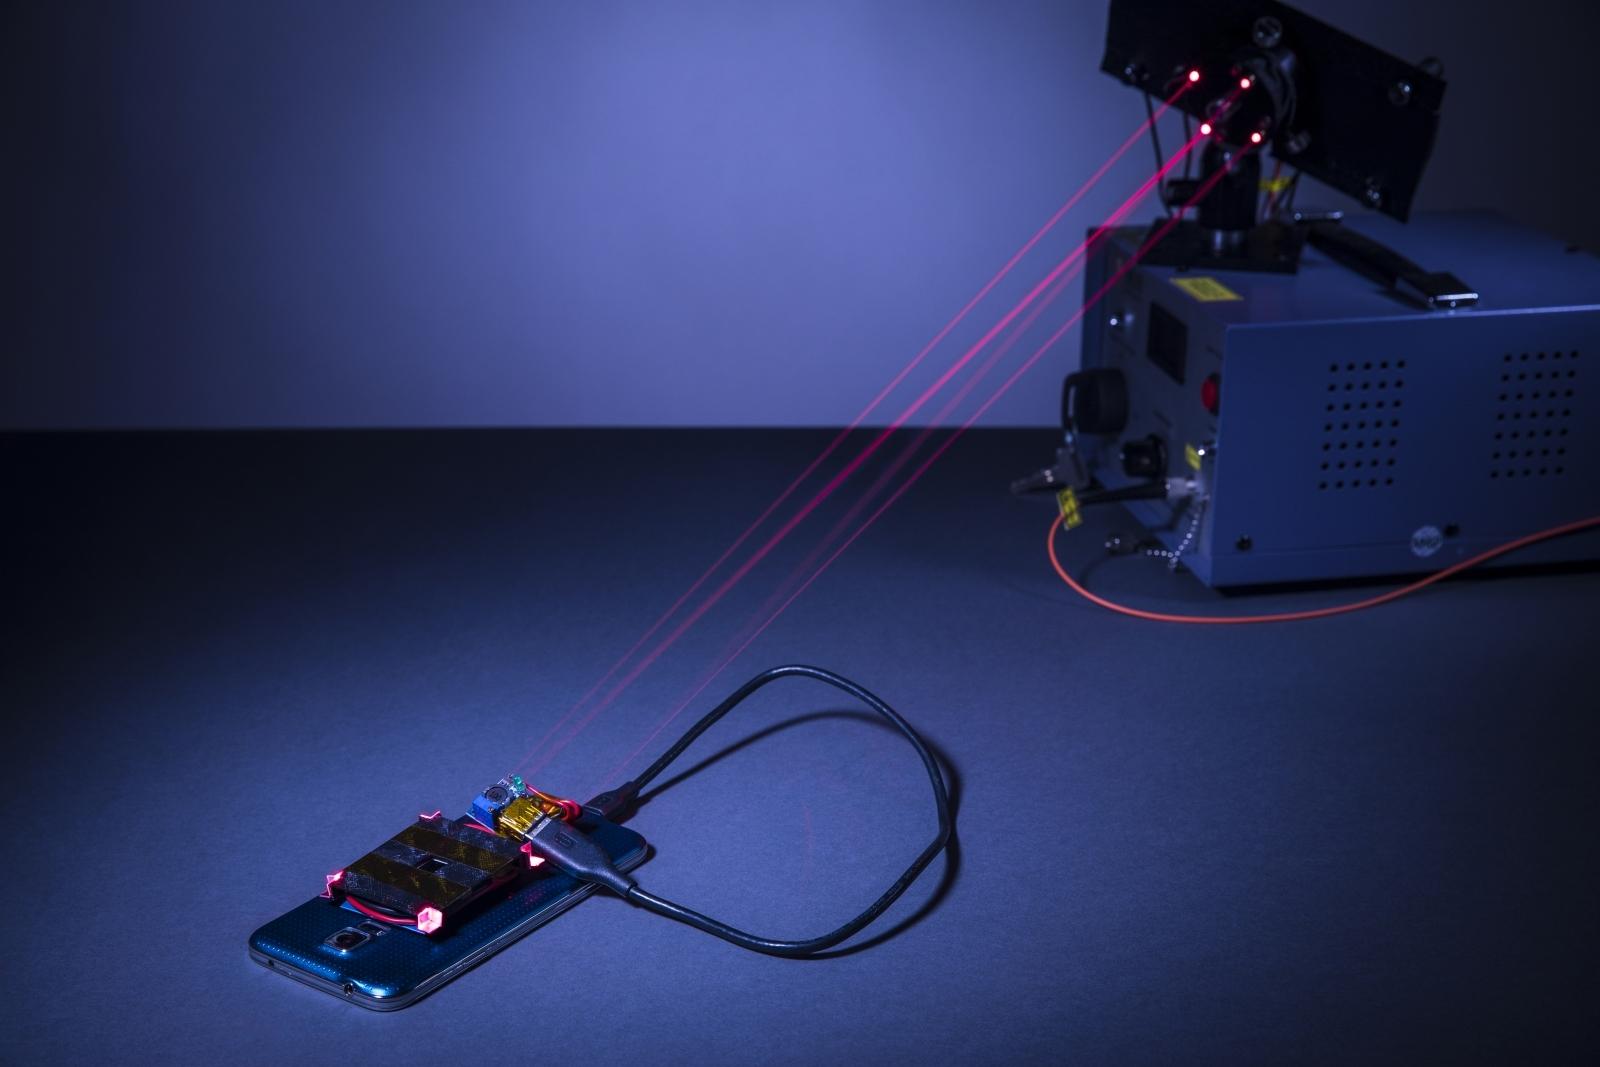 Laser charger